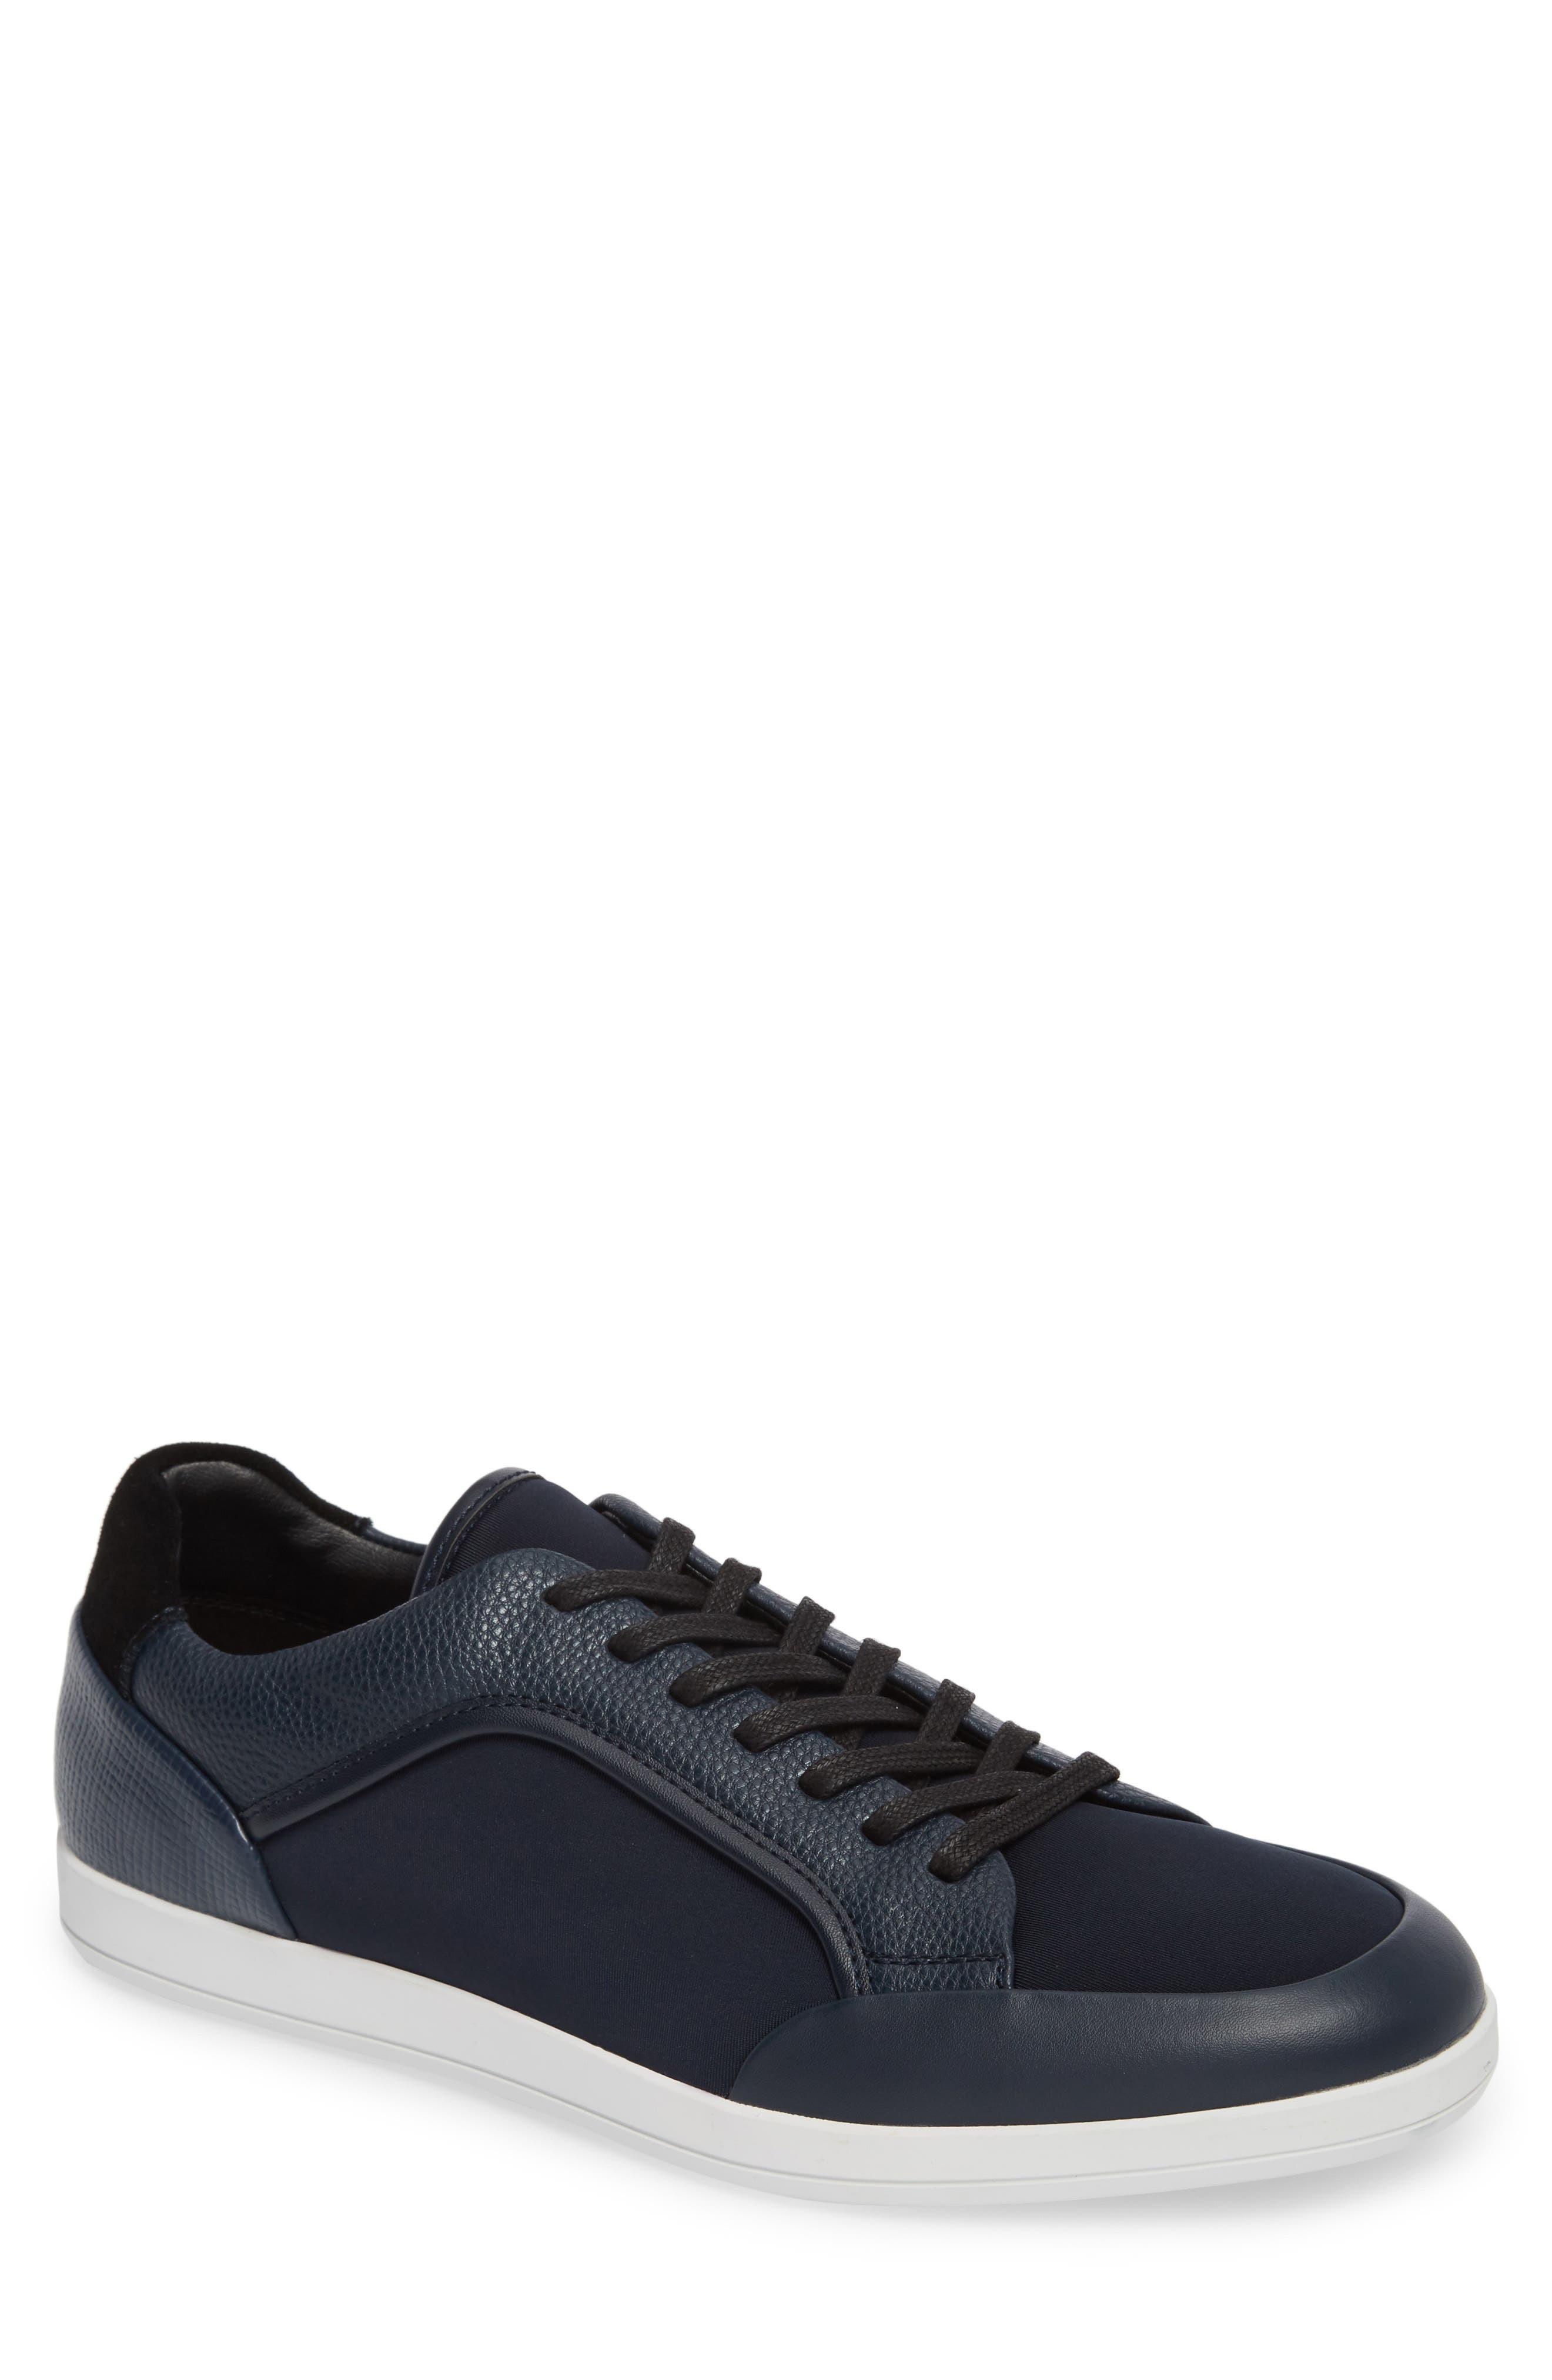 Masen Sneaker,                         Main,                         color, Dark Navy Lyrcra